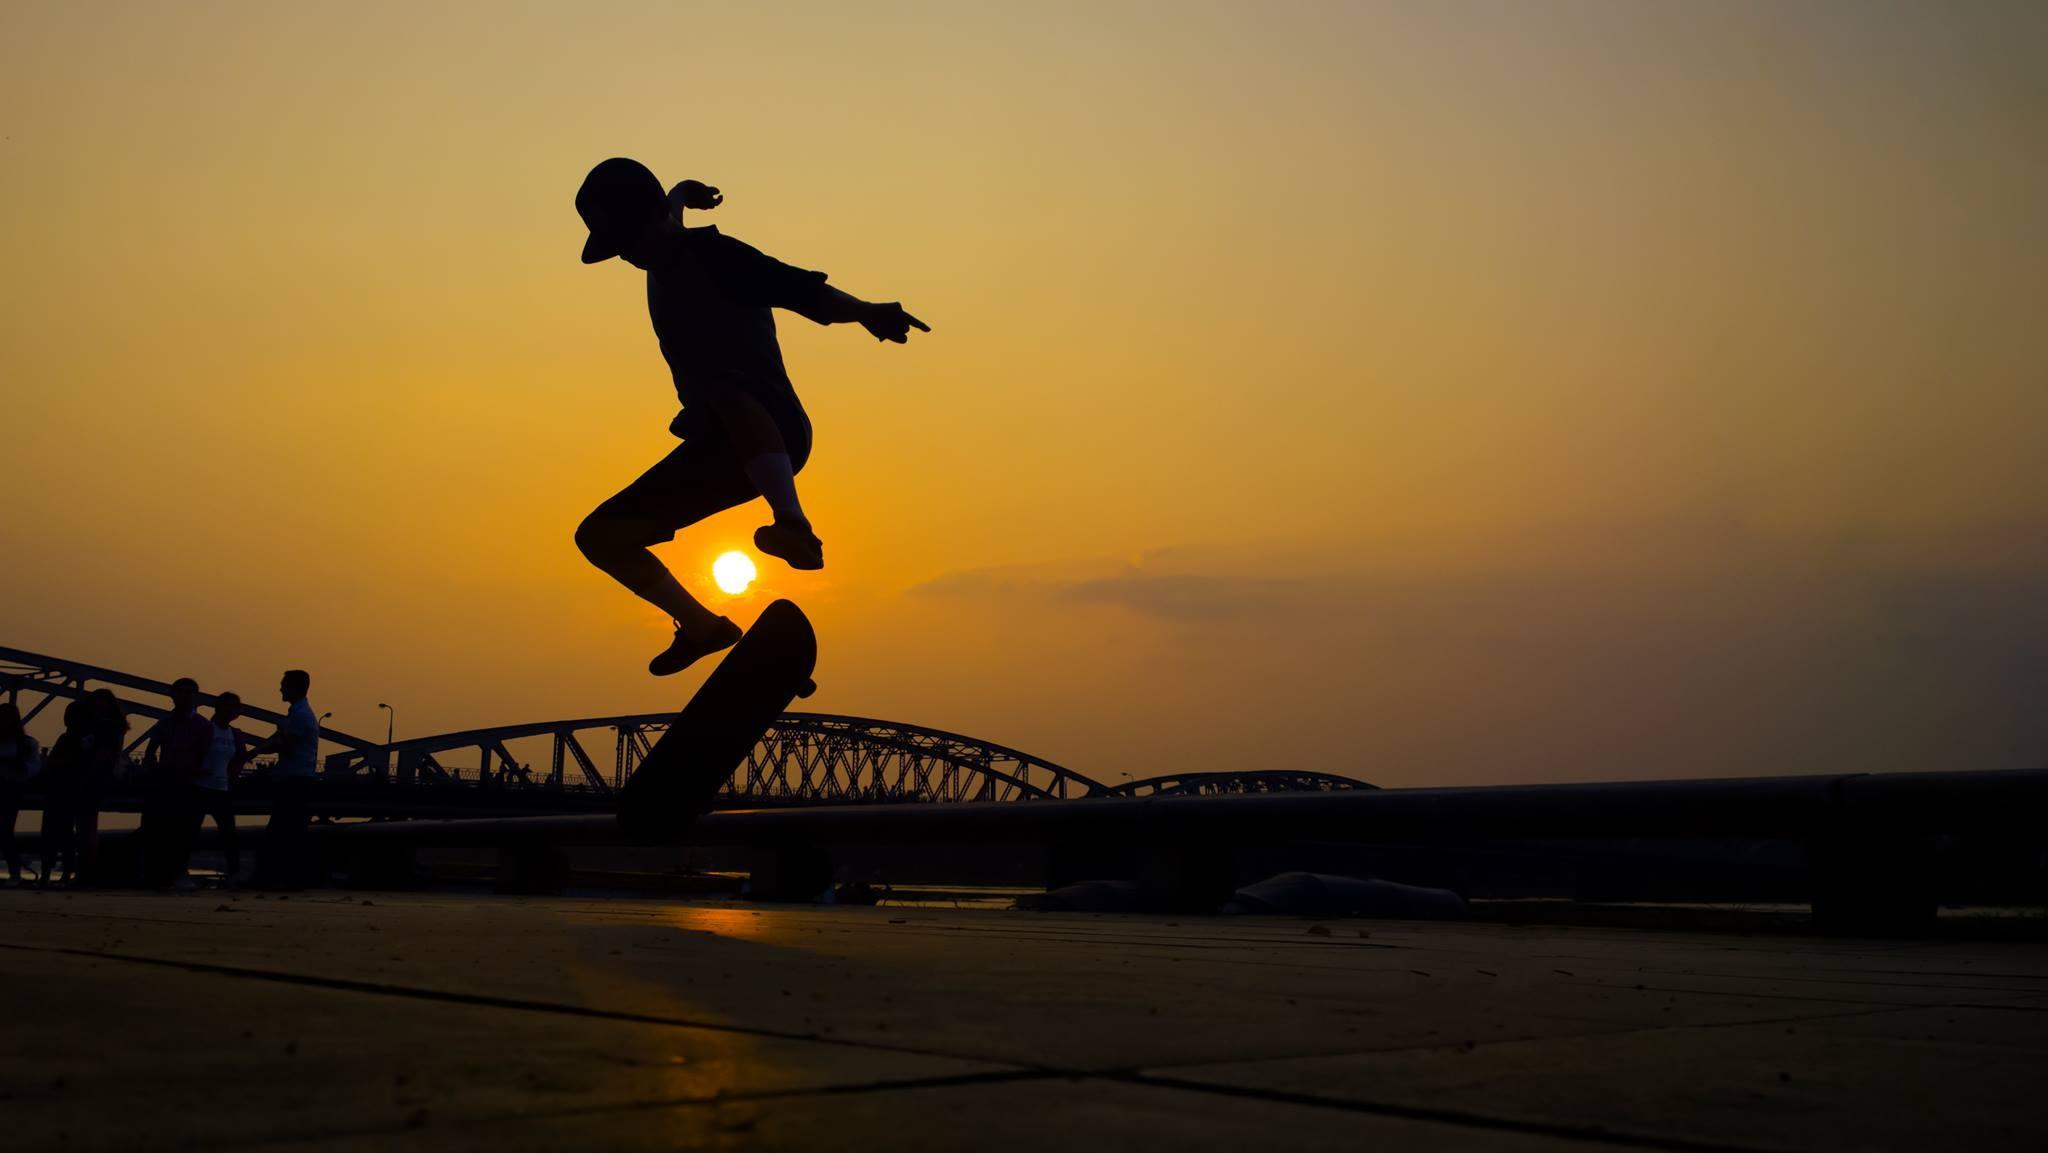 Free Images : silhouette, sunset, morning, skateboard ...